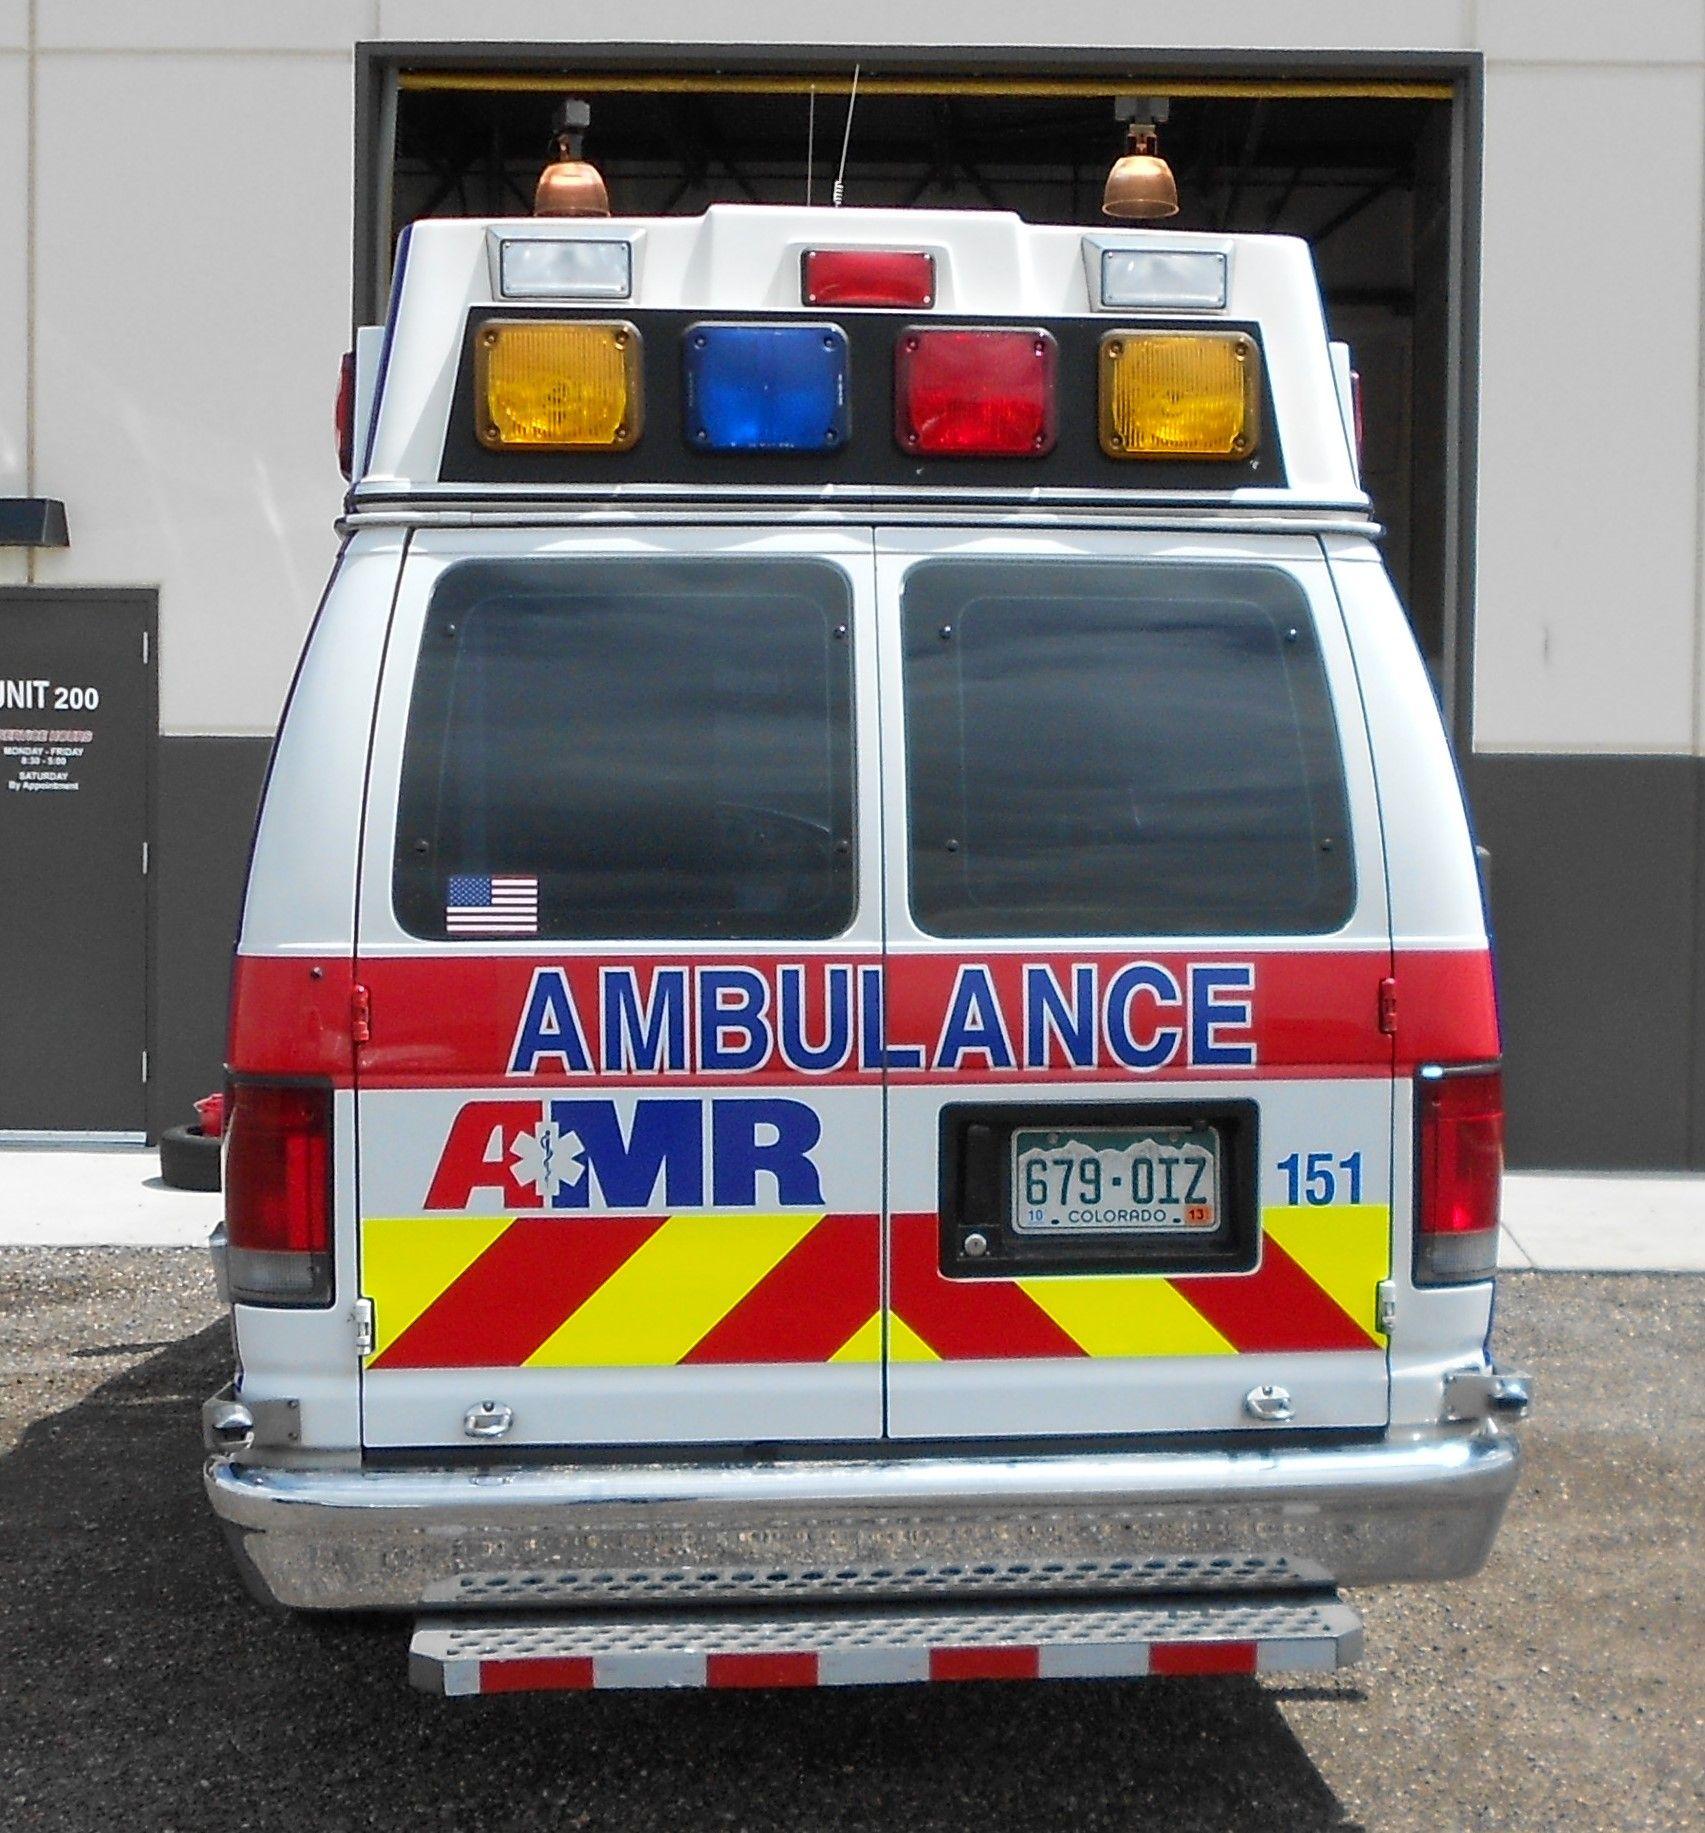 Vehiclegraphics Vehiclewraps Vehiclelettering Installationservices Vehiclegraphicsdesigns Signaramacolorado S Car Sticker Design Ambulance Car Lettering [ 1833 x 1705 Pixel ]